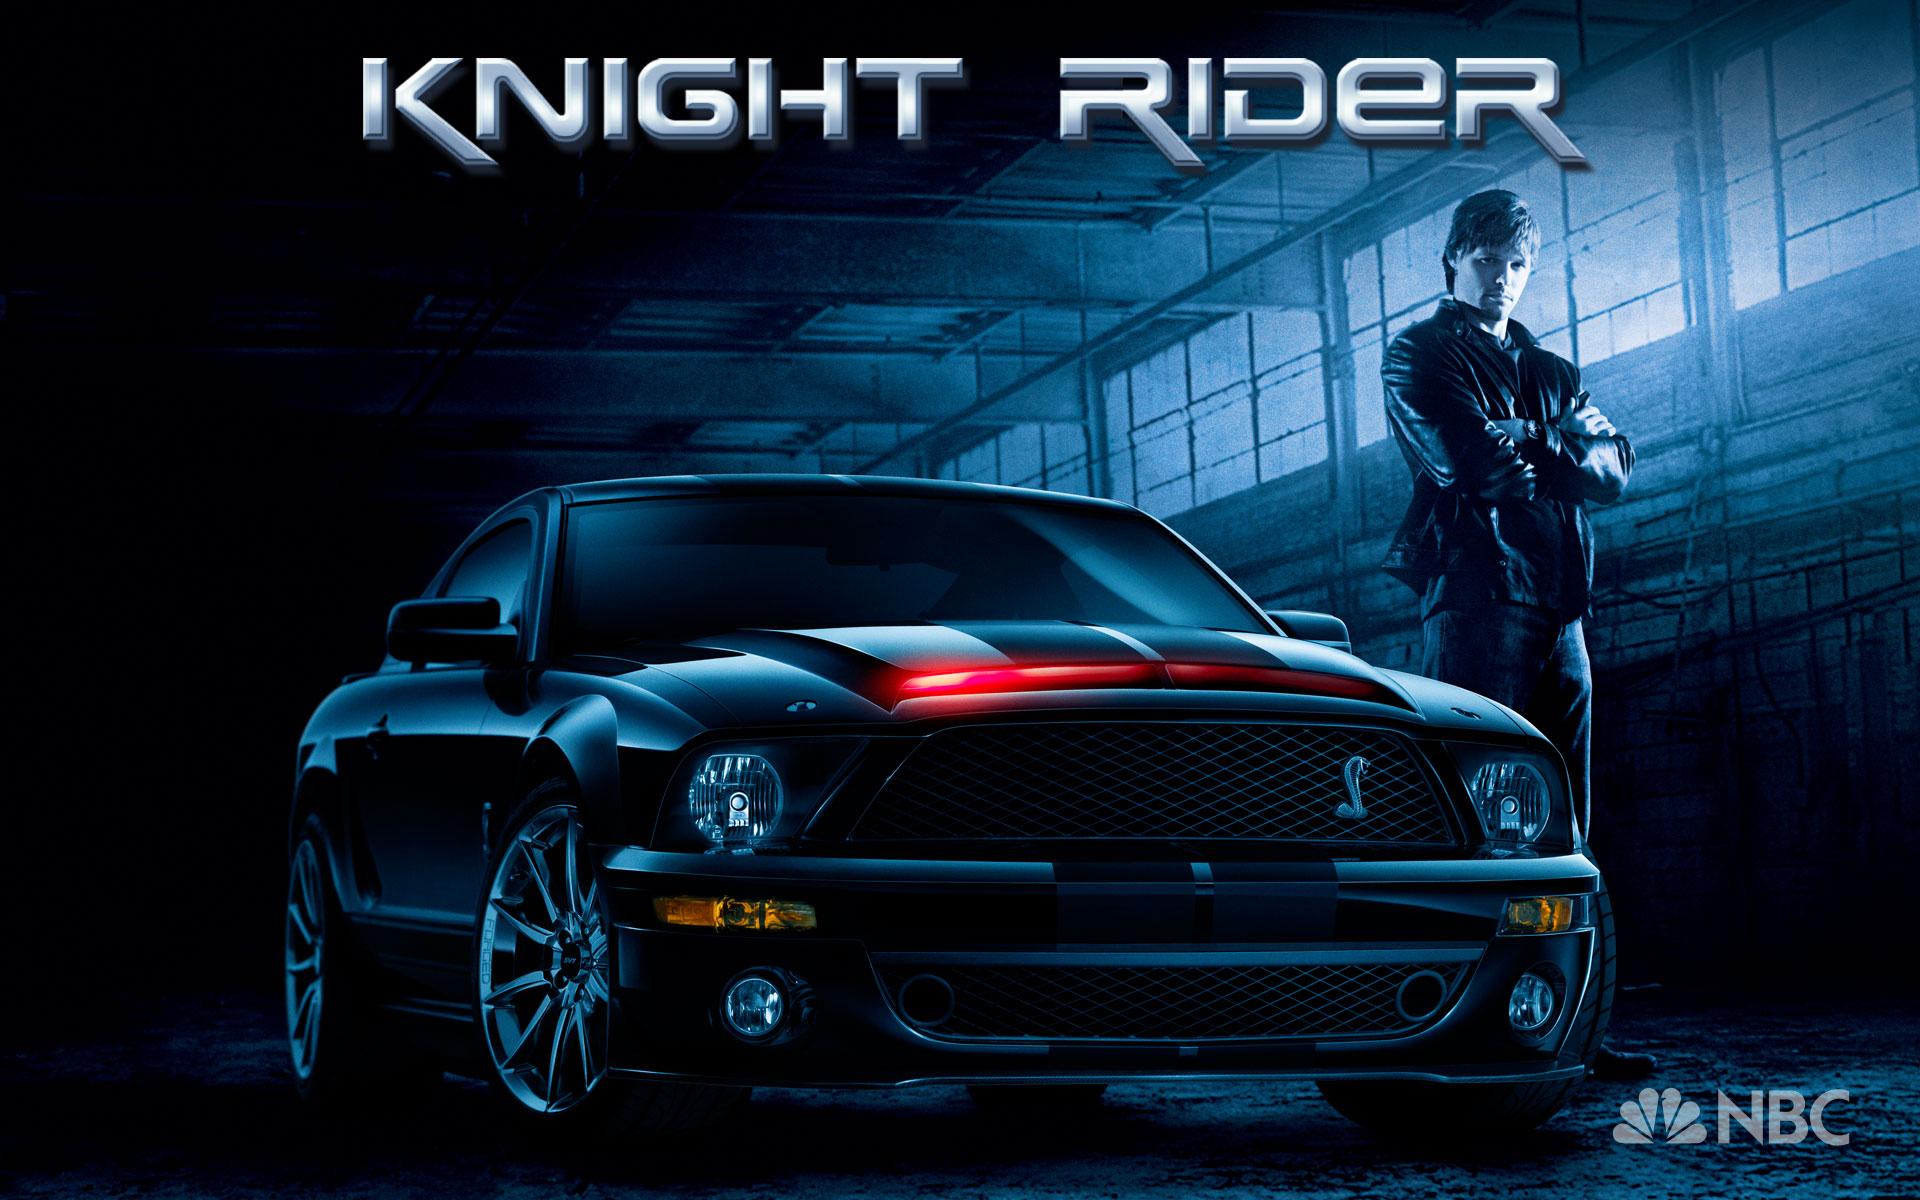 Webkliknl   Knight Rider wallpapers and screensavers 1920x1200